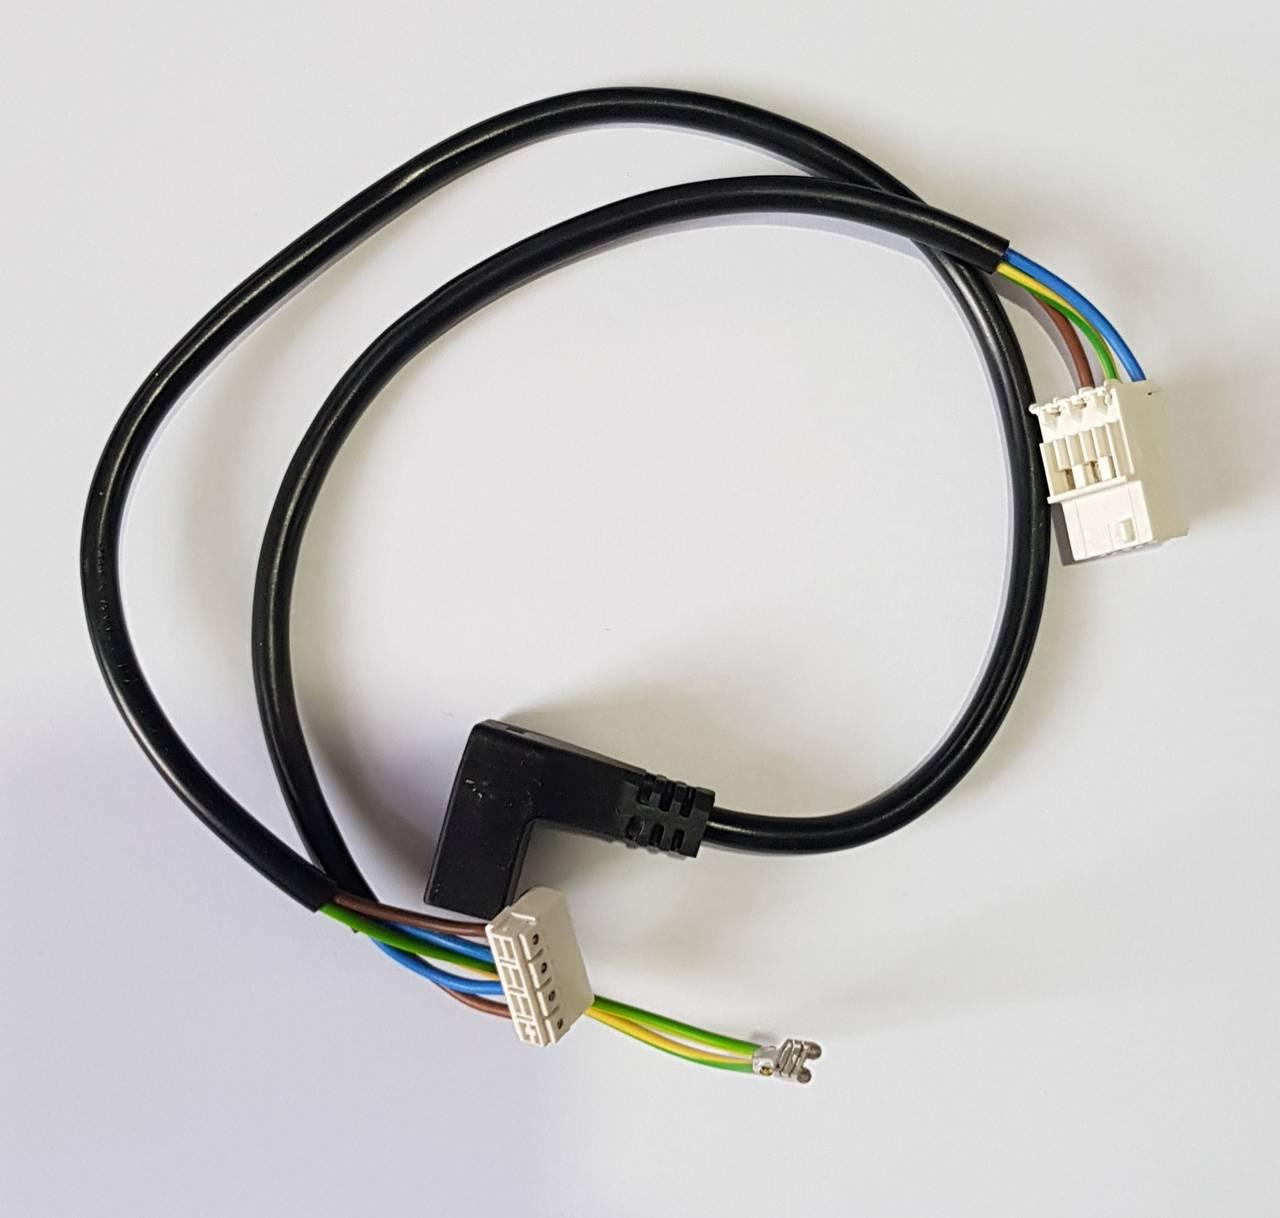 Sime conexion 4 pol cn 13 bomba-vent brava slim  - Foto 1